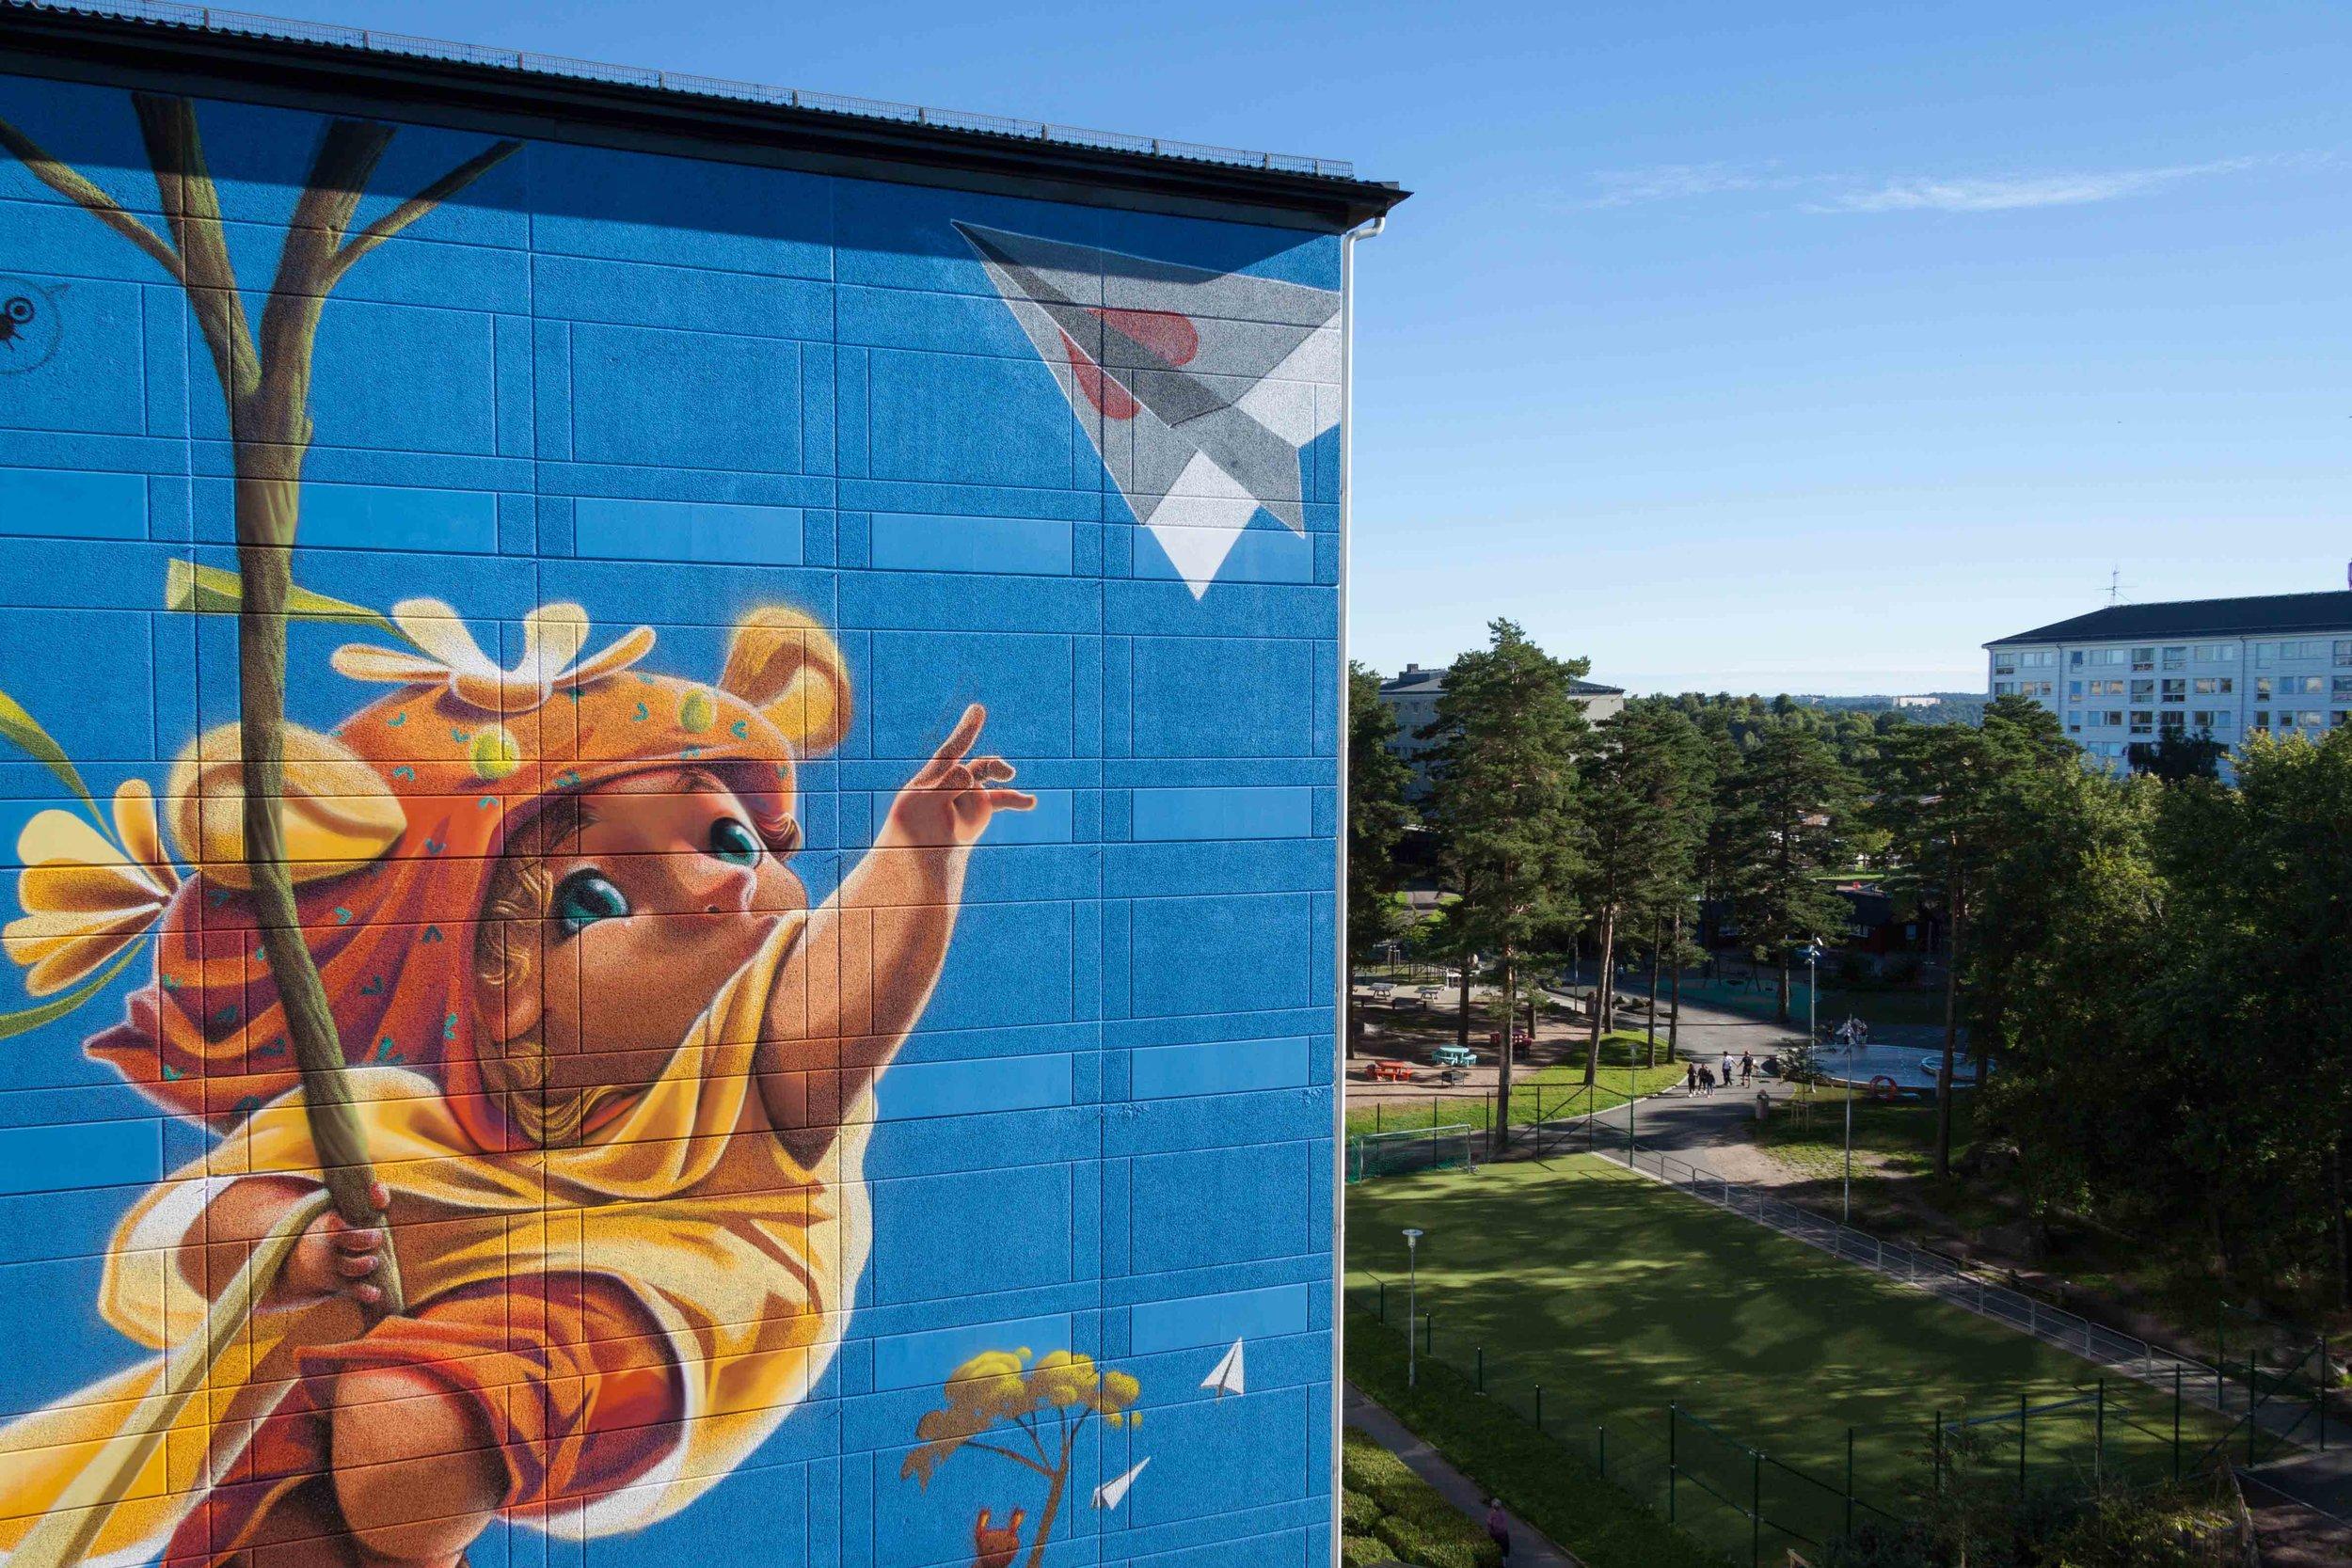 ANIMALITOLAND_Artscape_2016-08-16_FredrikÅkerberg_4752x3168.jpg